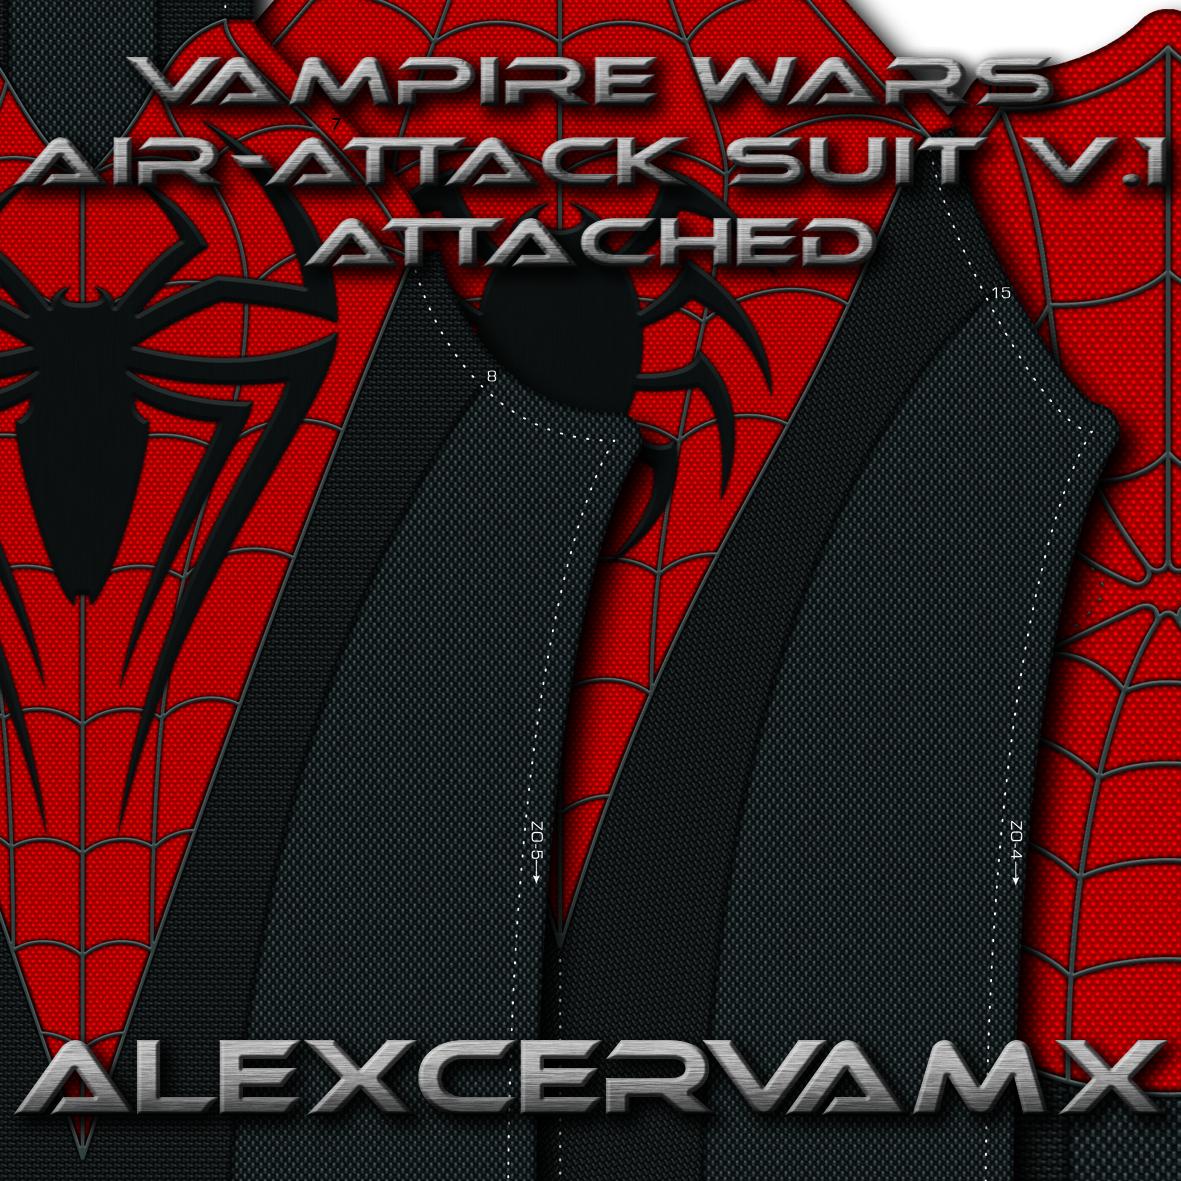 AlexCerva's SM Vampire Wars AirAttack Suit v1 Dye Sub Pattern